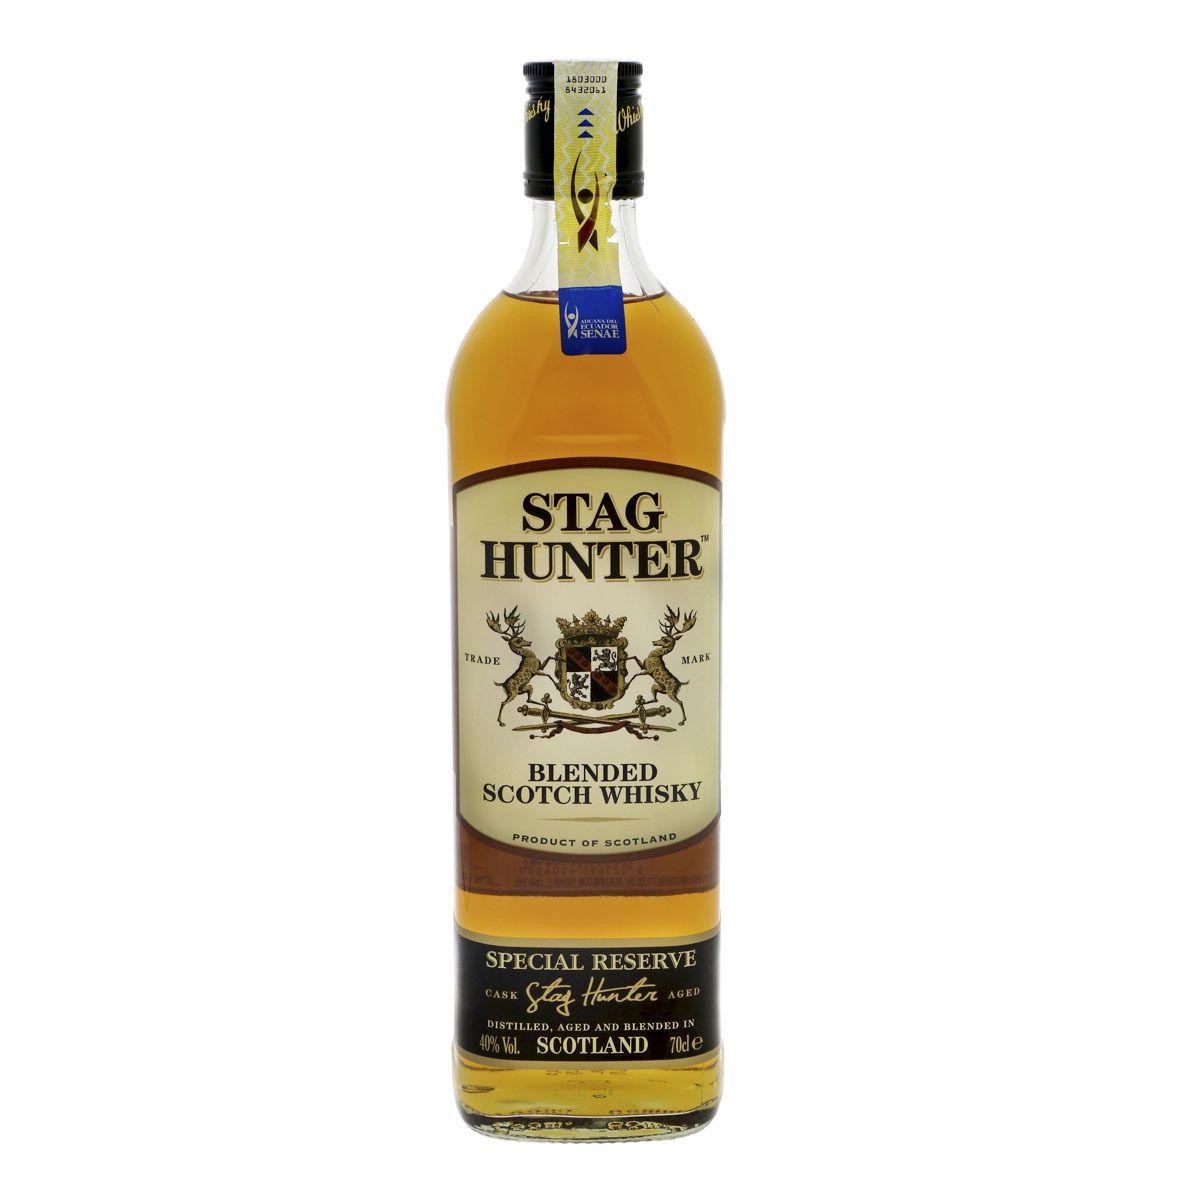 фото бутылки виски Стаг Хантер